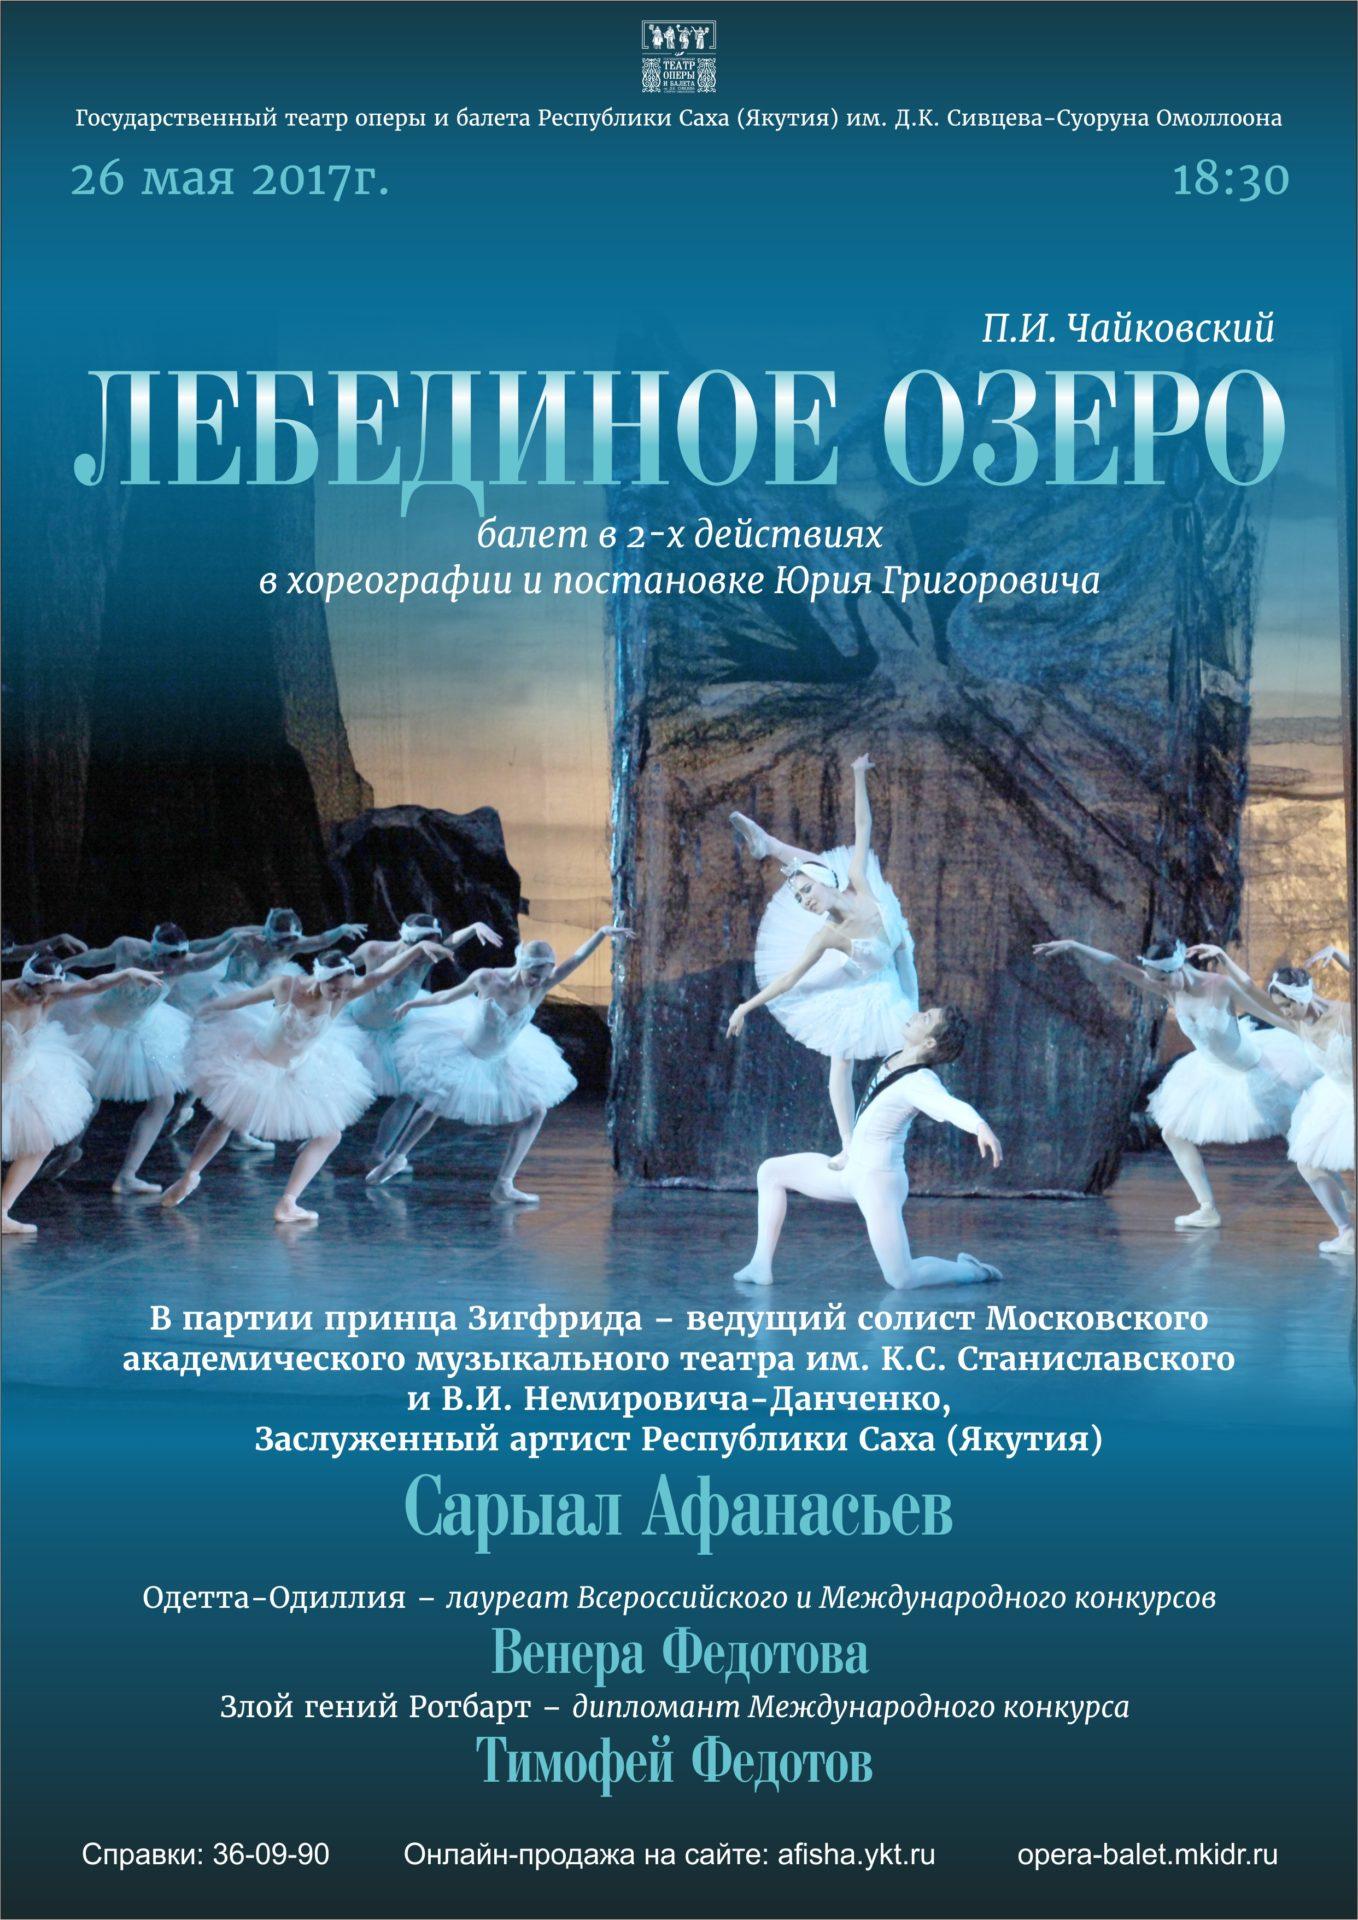 Артист балета Сарыал Афанасьев стал «Заслуженным артистом Якутии»